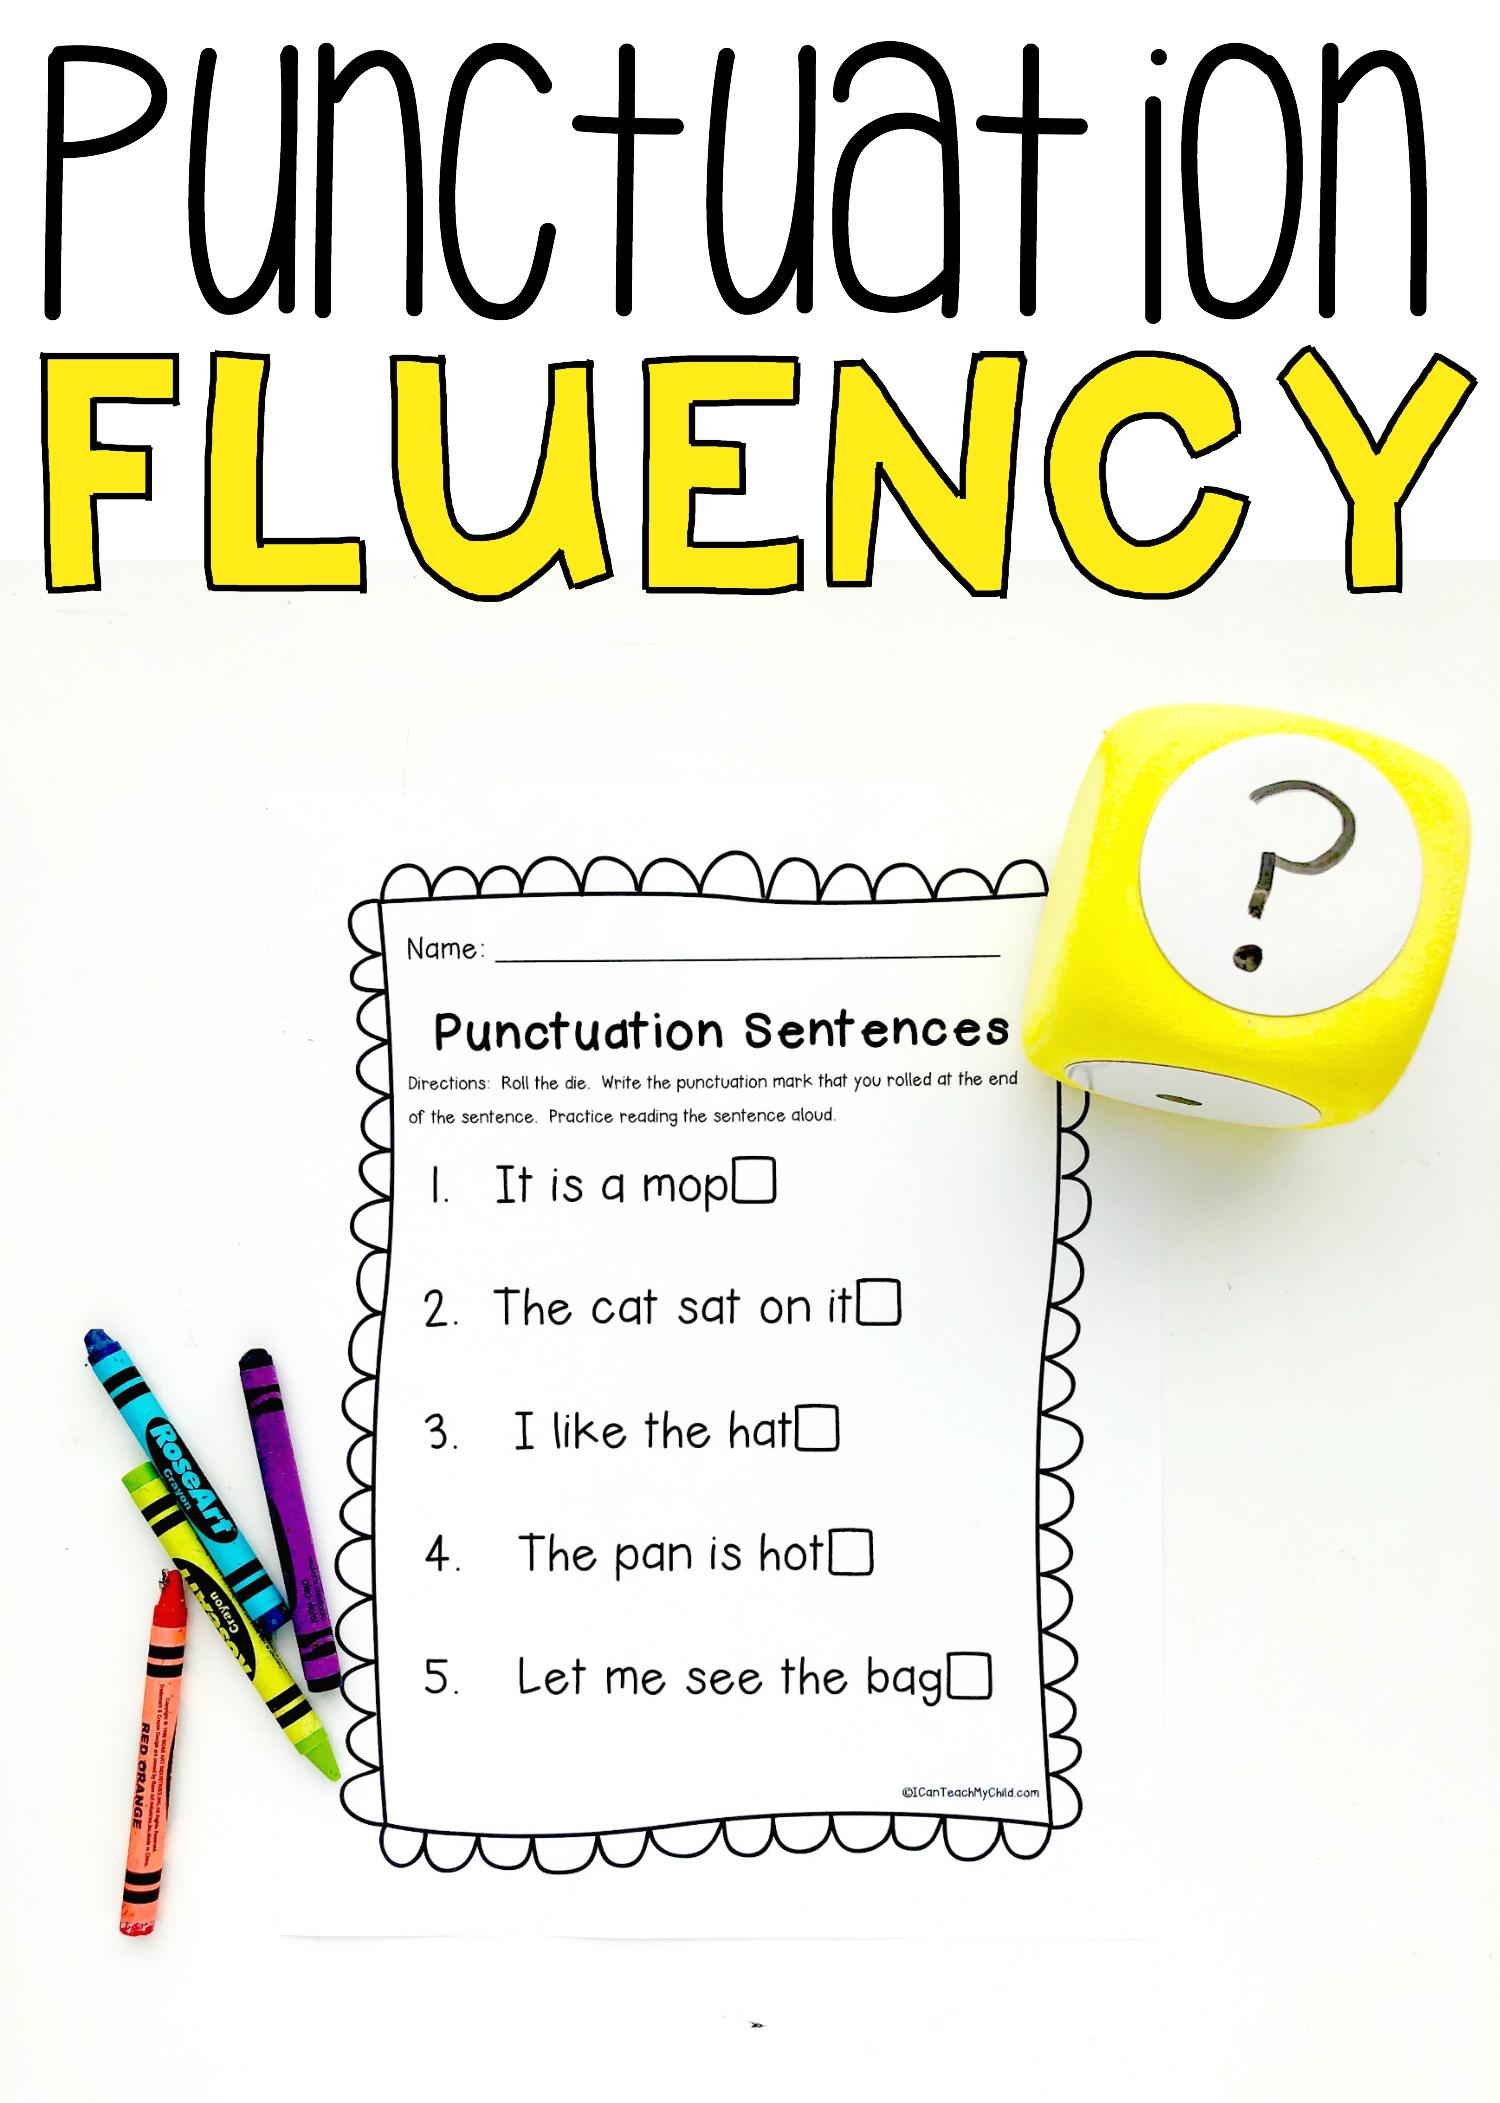 Punctuation Sentences For Fluency Printable